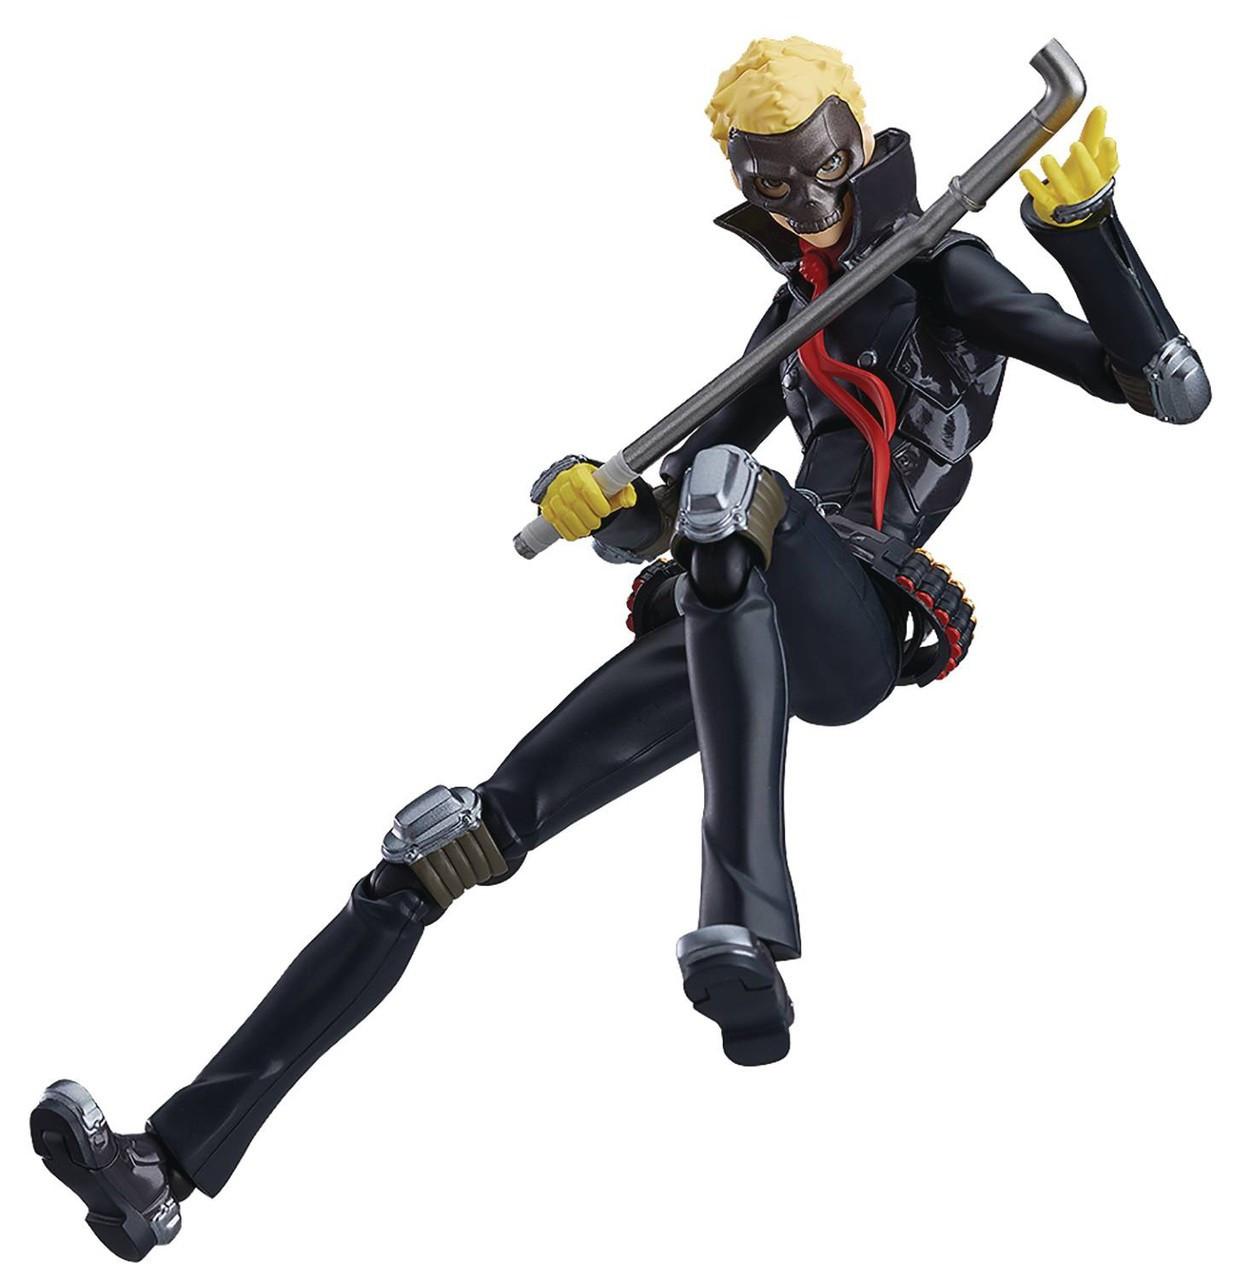 Persona 5 Figma Skull 6 1 Action Figure Ryuji Sakamoto Max